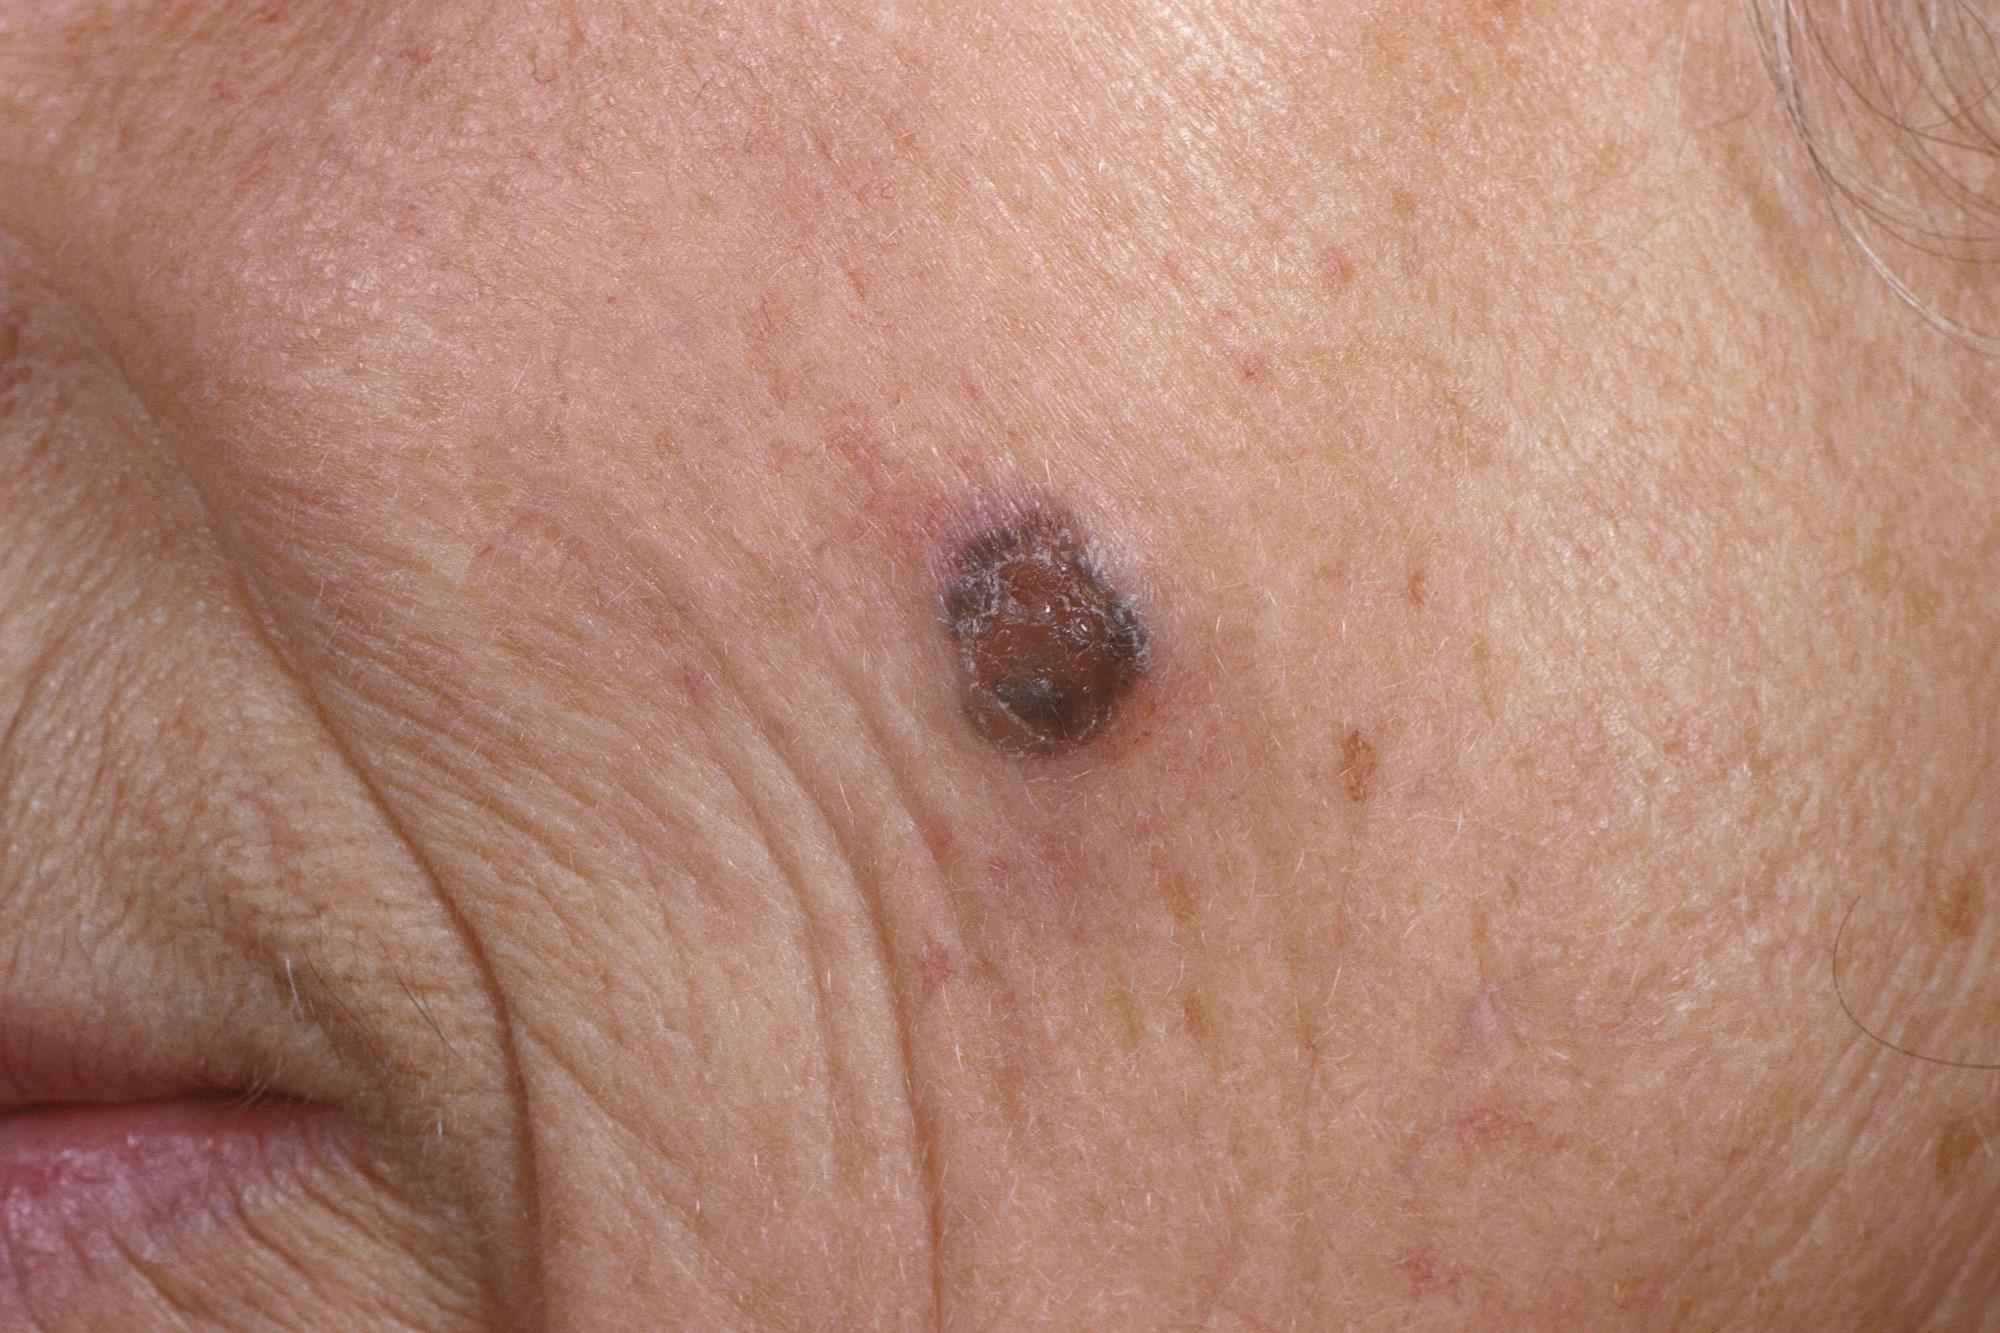 Age, Education Predict Skin Protection Following Melanoma Diagnosis